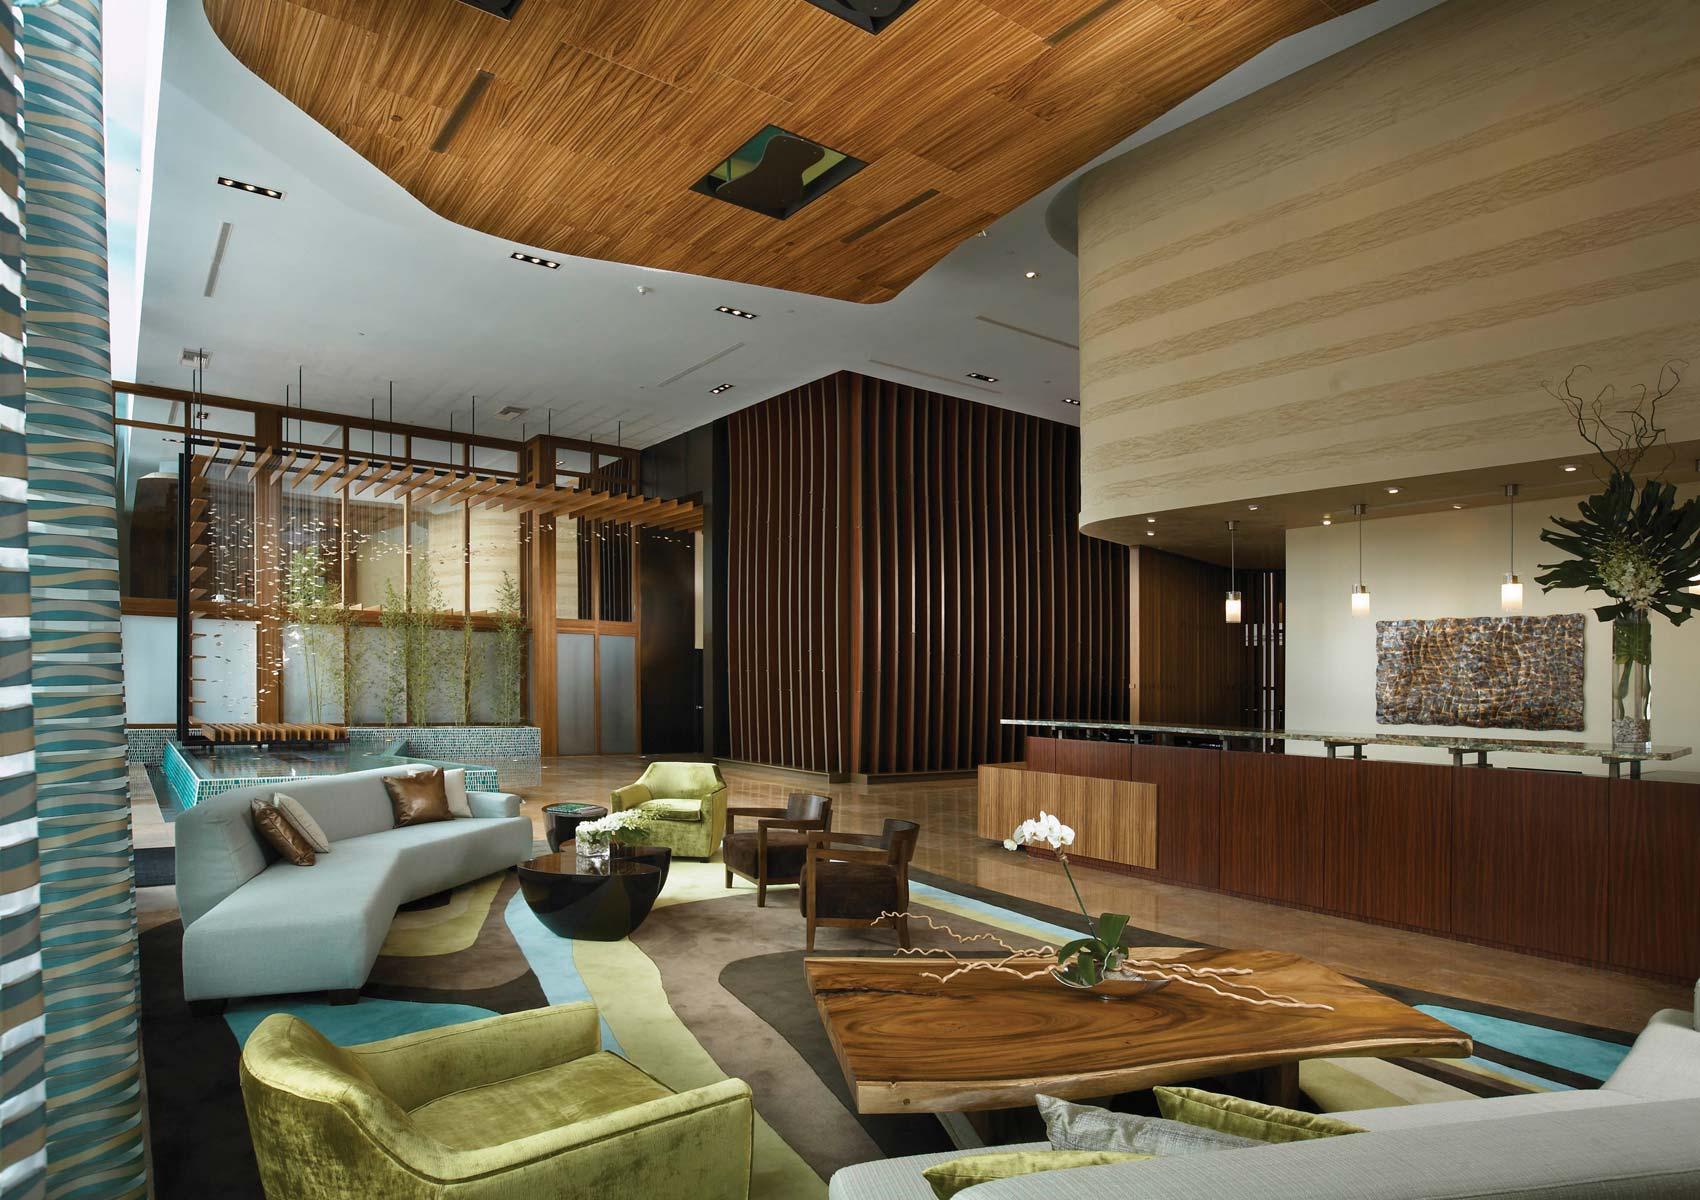 Apogee Beach Condos In Hollywood Florida Lobby Sales By Brosda Bentley 786